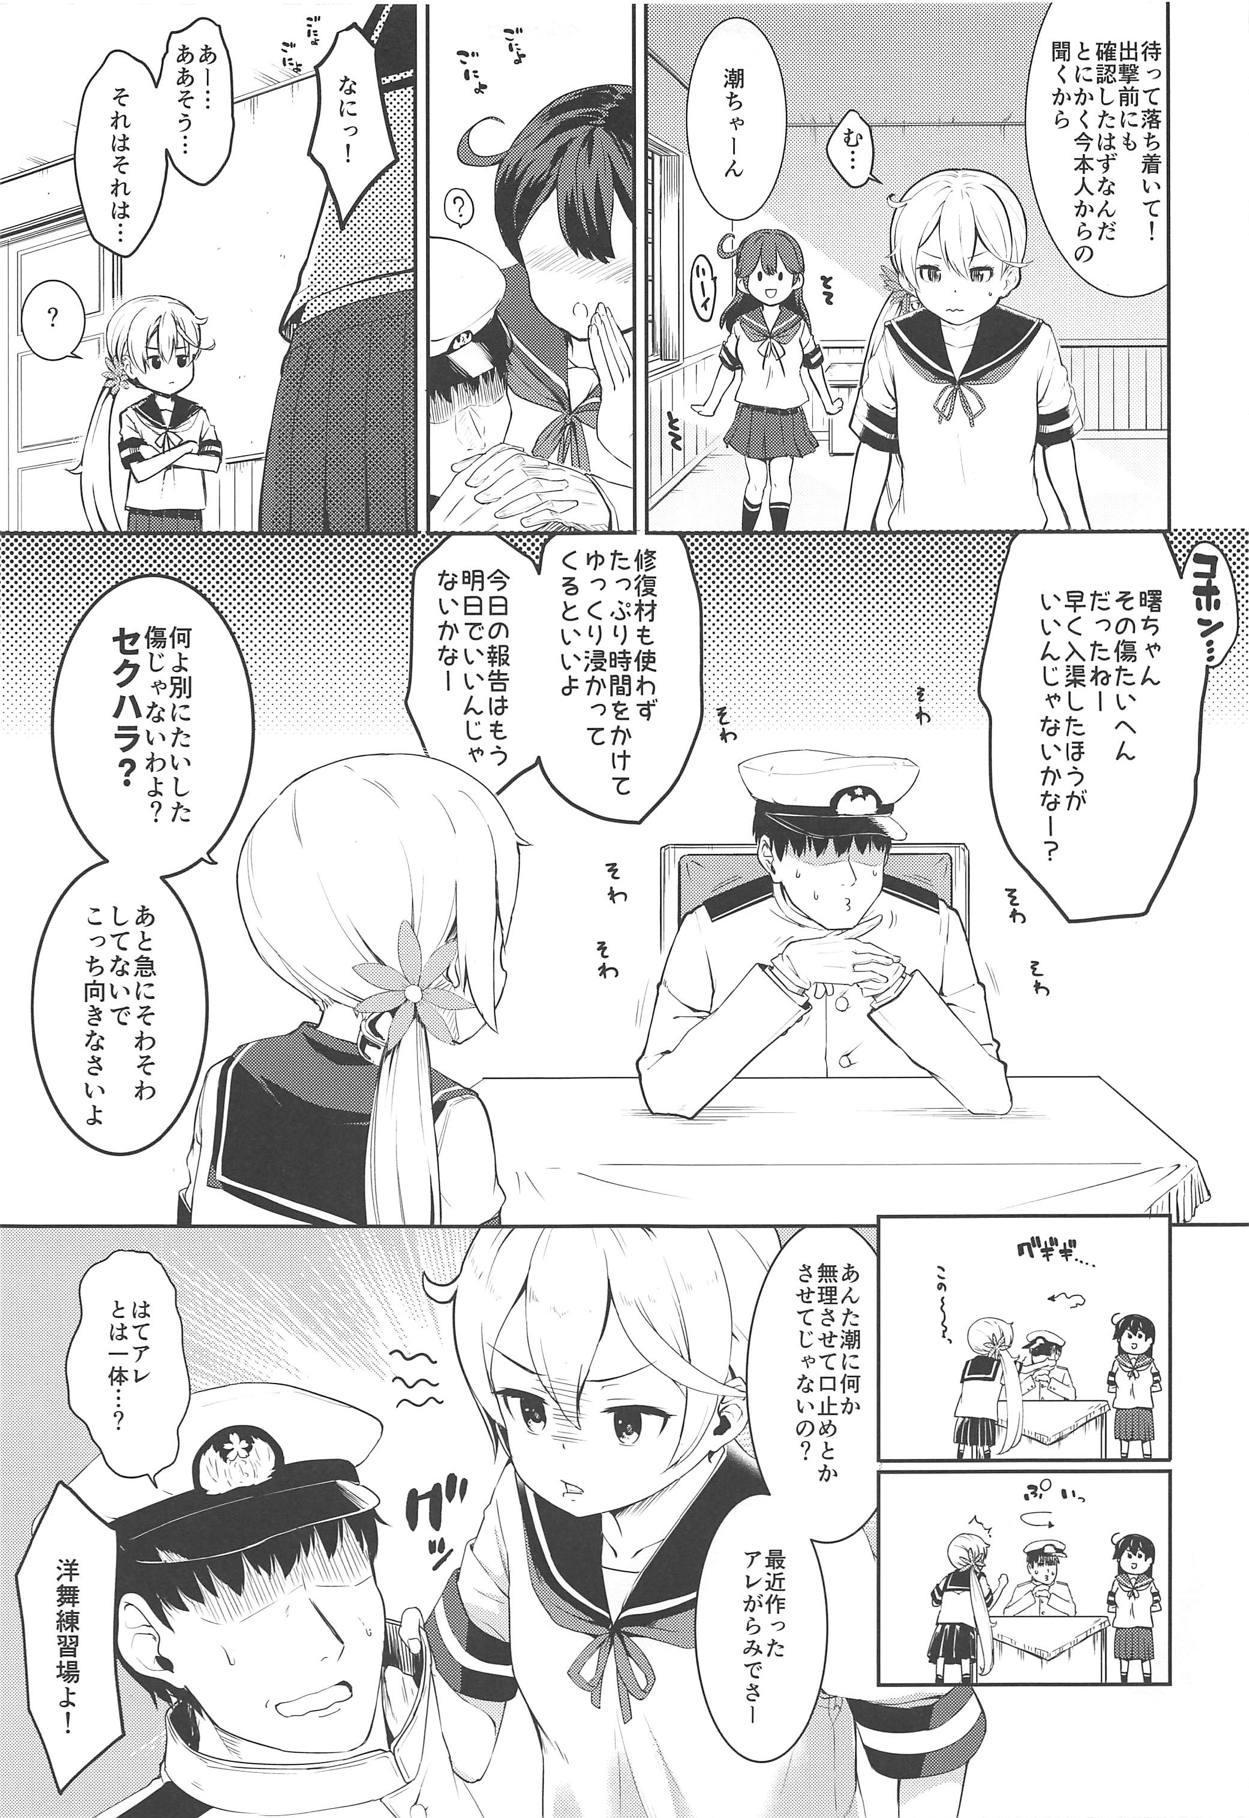 Kanmusu Youbu Enshuu 3